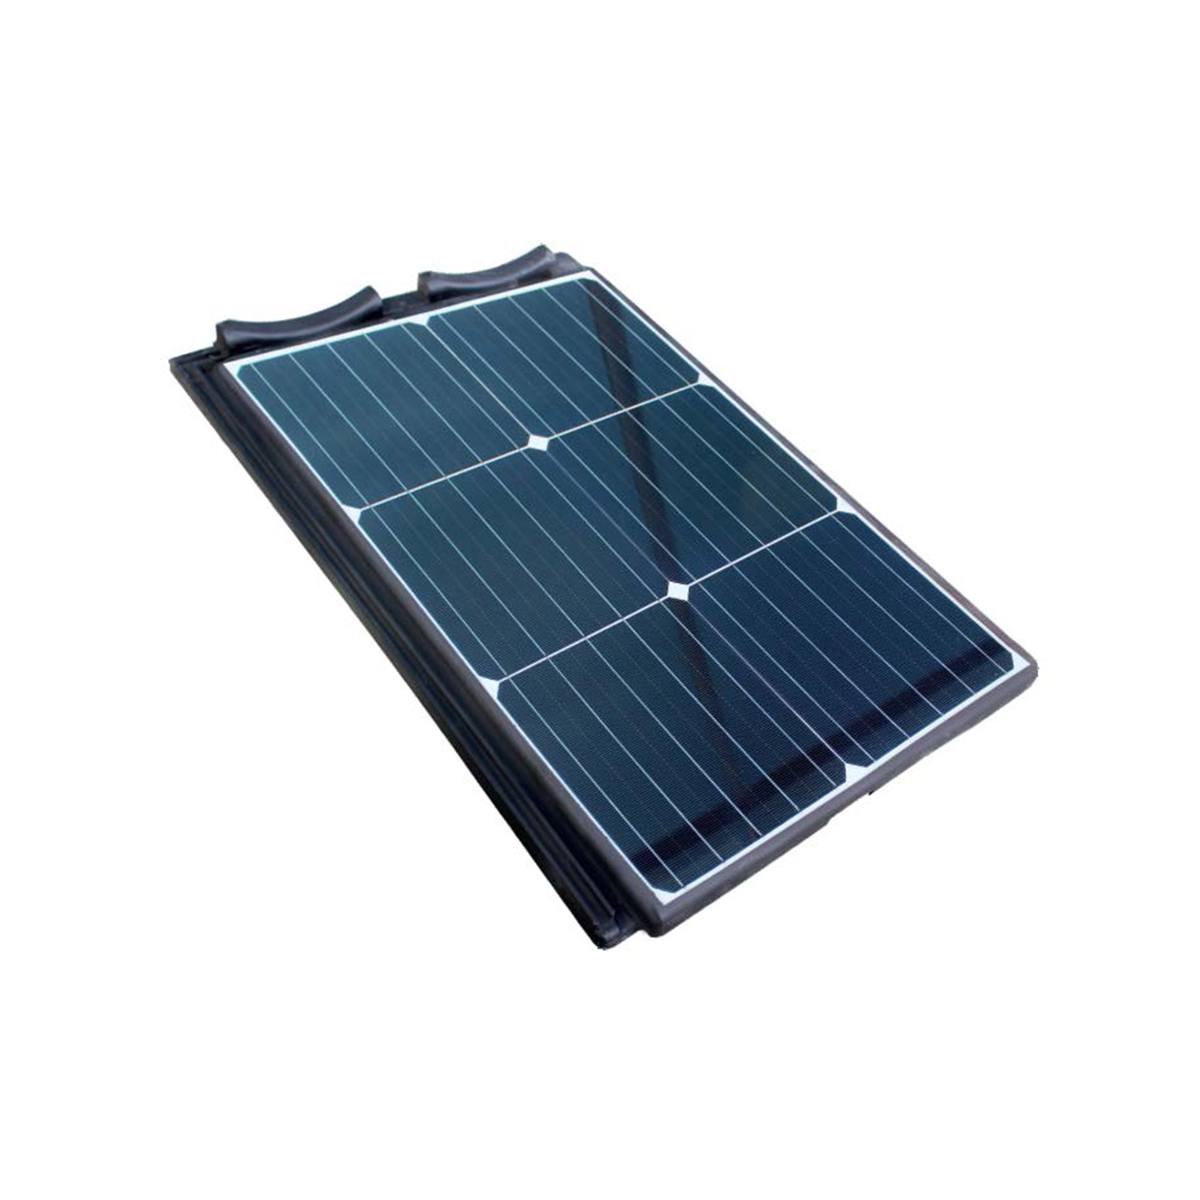 Odul solar 32W panel, odul solar 32Watt panel, Odul solar 32 W panel, odul solar 32 Watt panel, odul solar 32 Watt monokristal solar kiremit panel, Odul solar 32 W watt gunes paneli, odul solar 32 W watt monokristal solar kiremit gunes paneli, odul solar 32 W Watt fotovoltaik monokristal solar kiremit panel, odul solar 32W monokristal solar kiremit gunes enerjisi, odul solar OSMp6-32W panel, ÖDÜL SOLAR 32 WATT